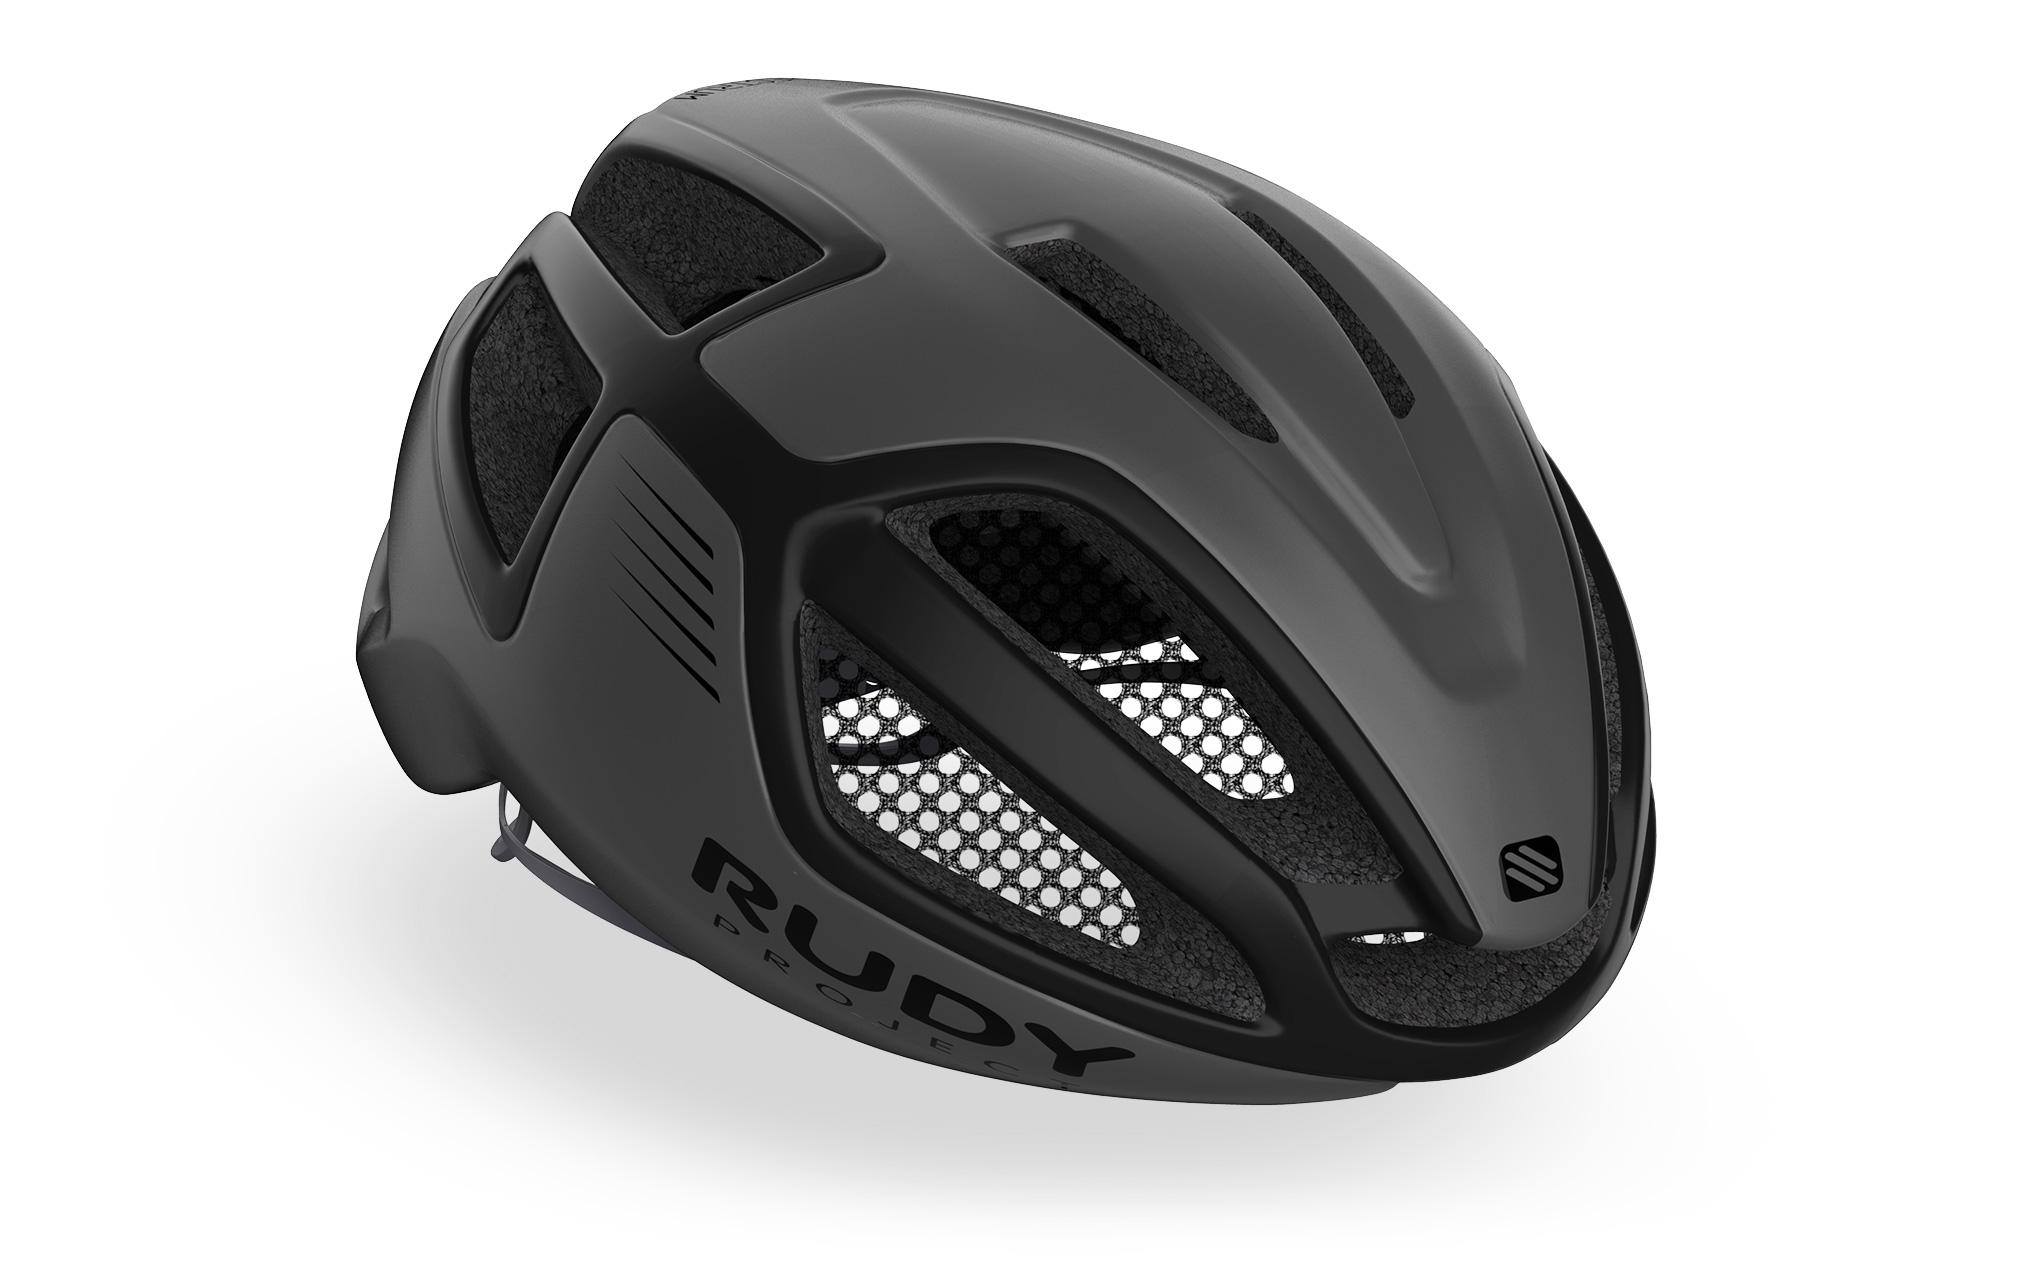 af186480111c Helmets Spectrum - Rudy Project